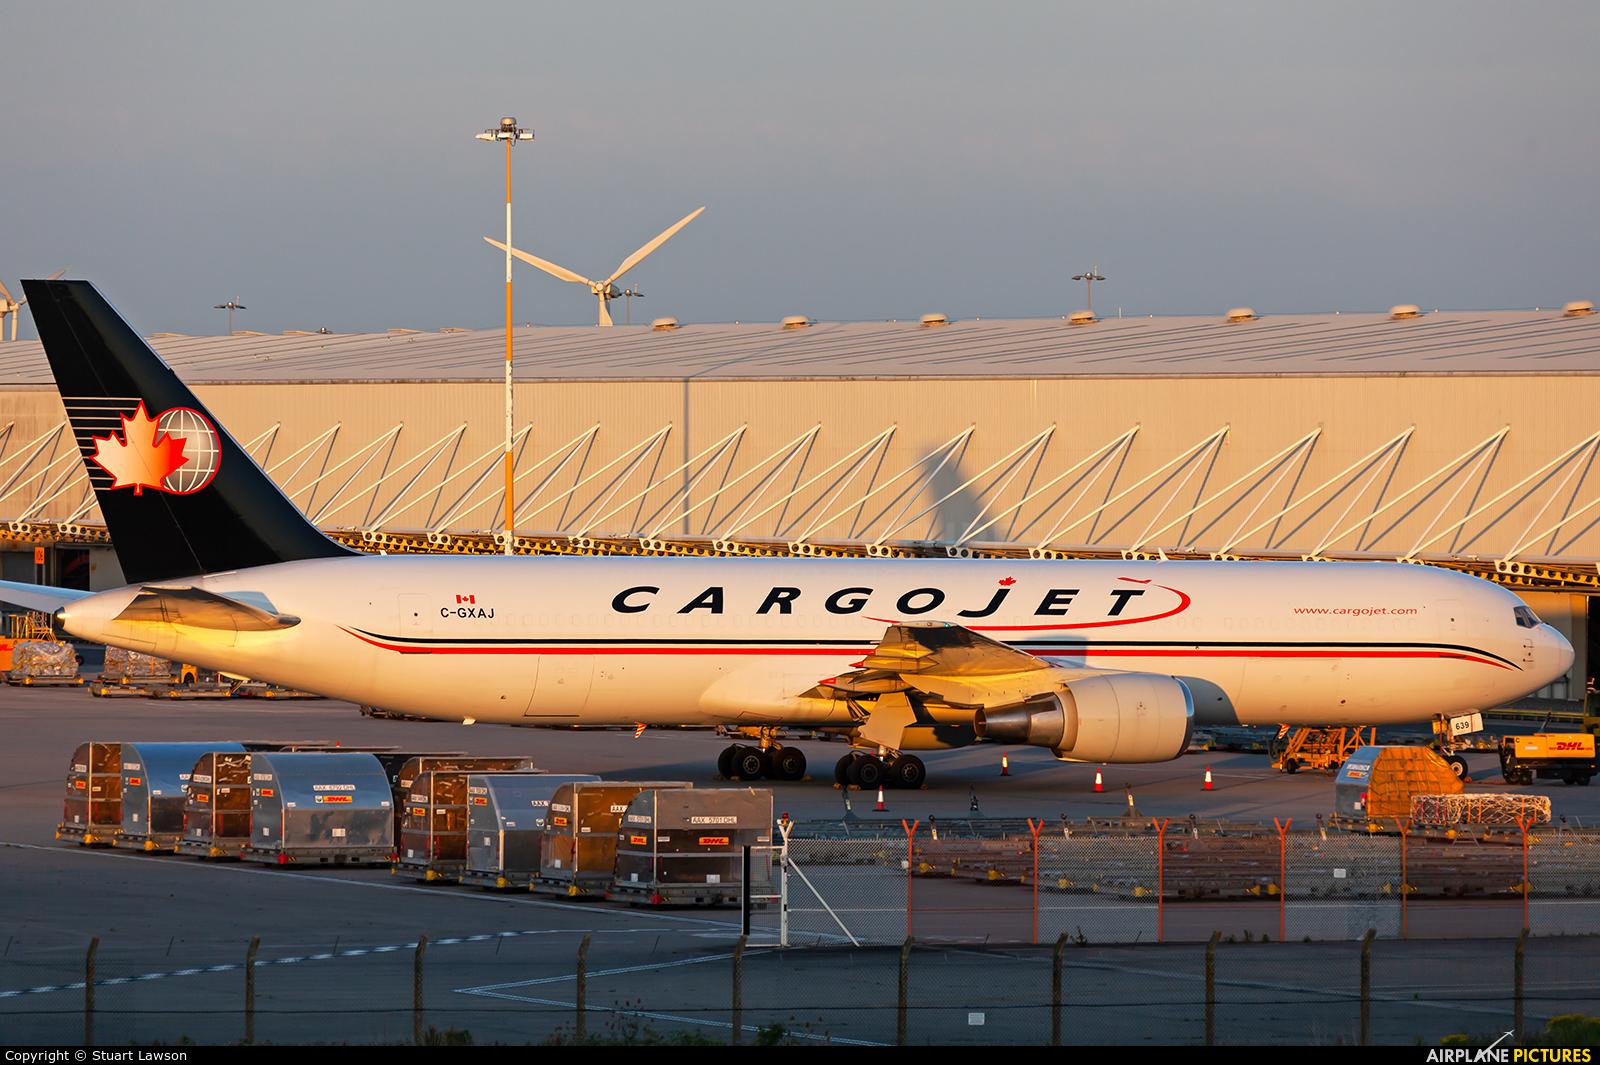 Cargojet Airways C-GXAJ aircraft at East Midlands